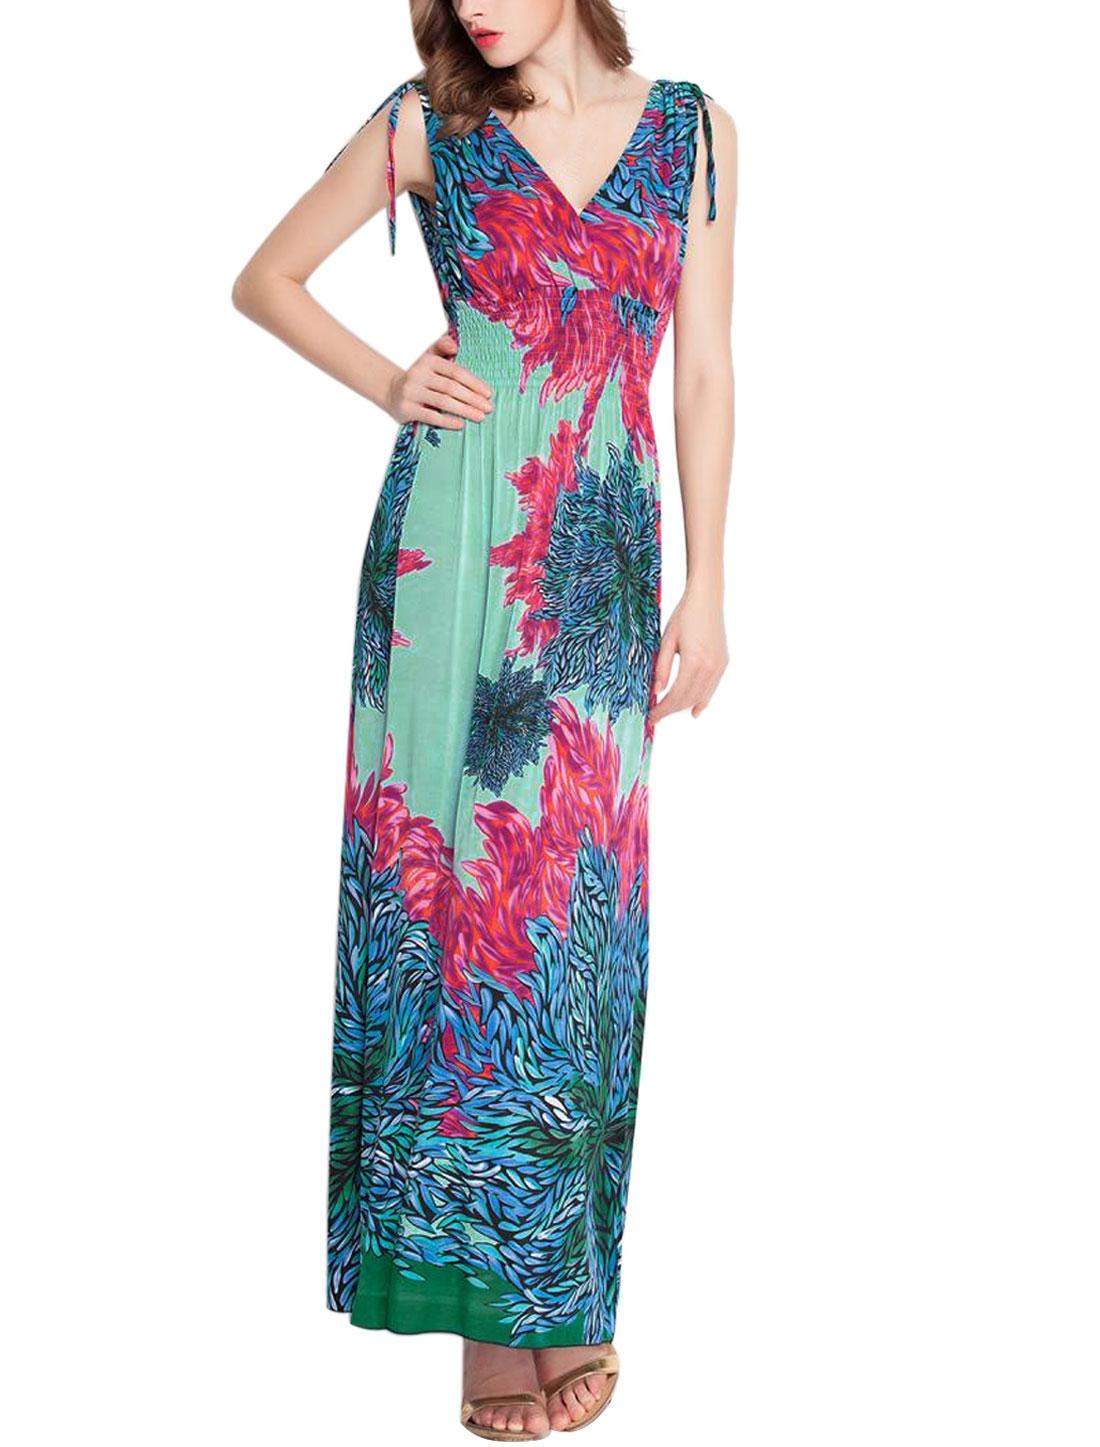 Women Deep V Neck Sleeveless Plants Print Long Dress Mint S